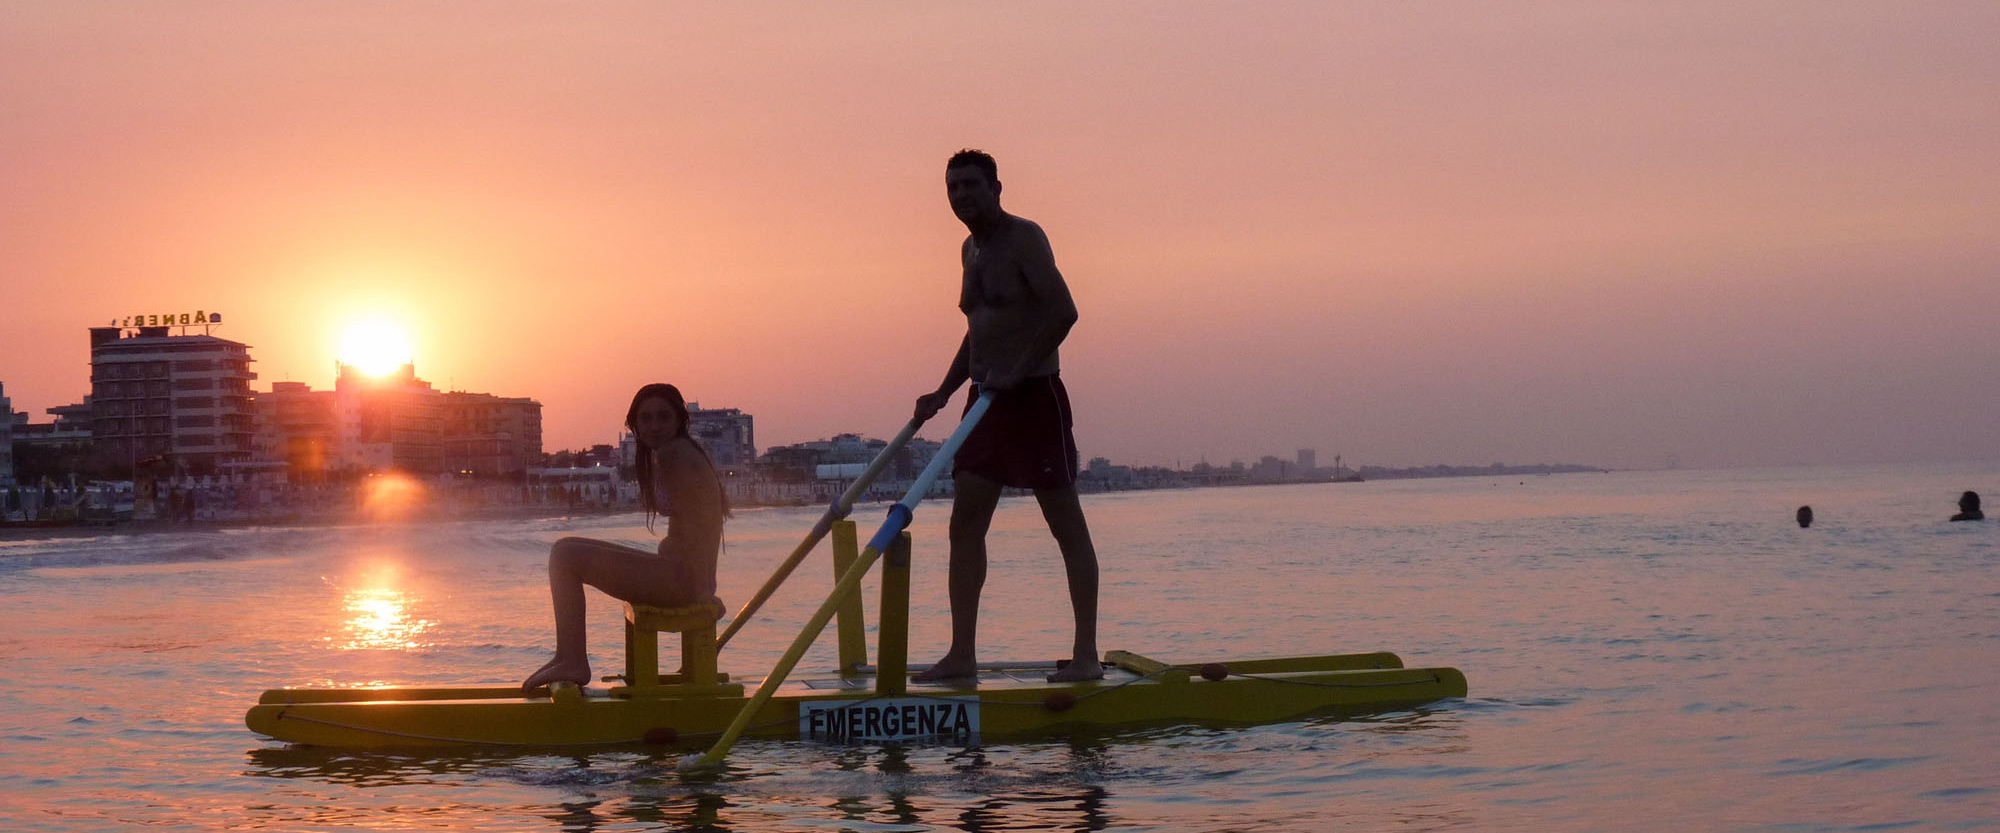 http://www.spiaggia53.it/wp-content/uploads/2017/02/slider-spiaggia53-2.jpg